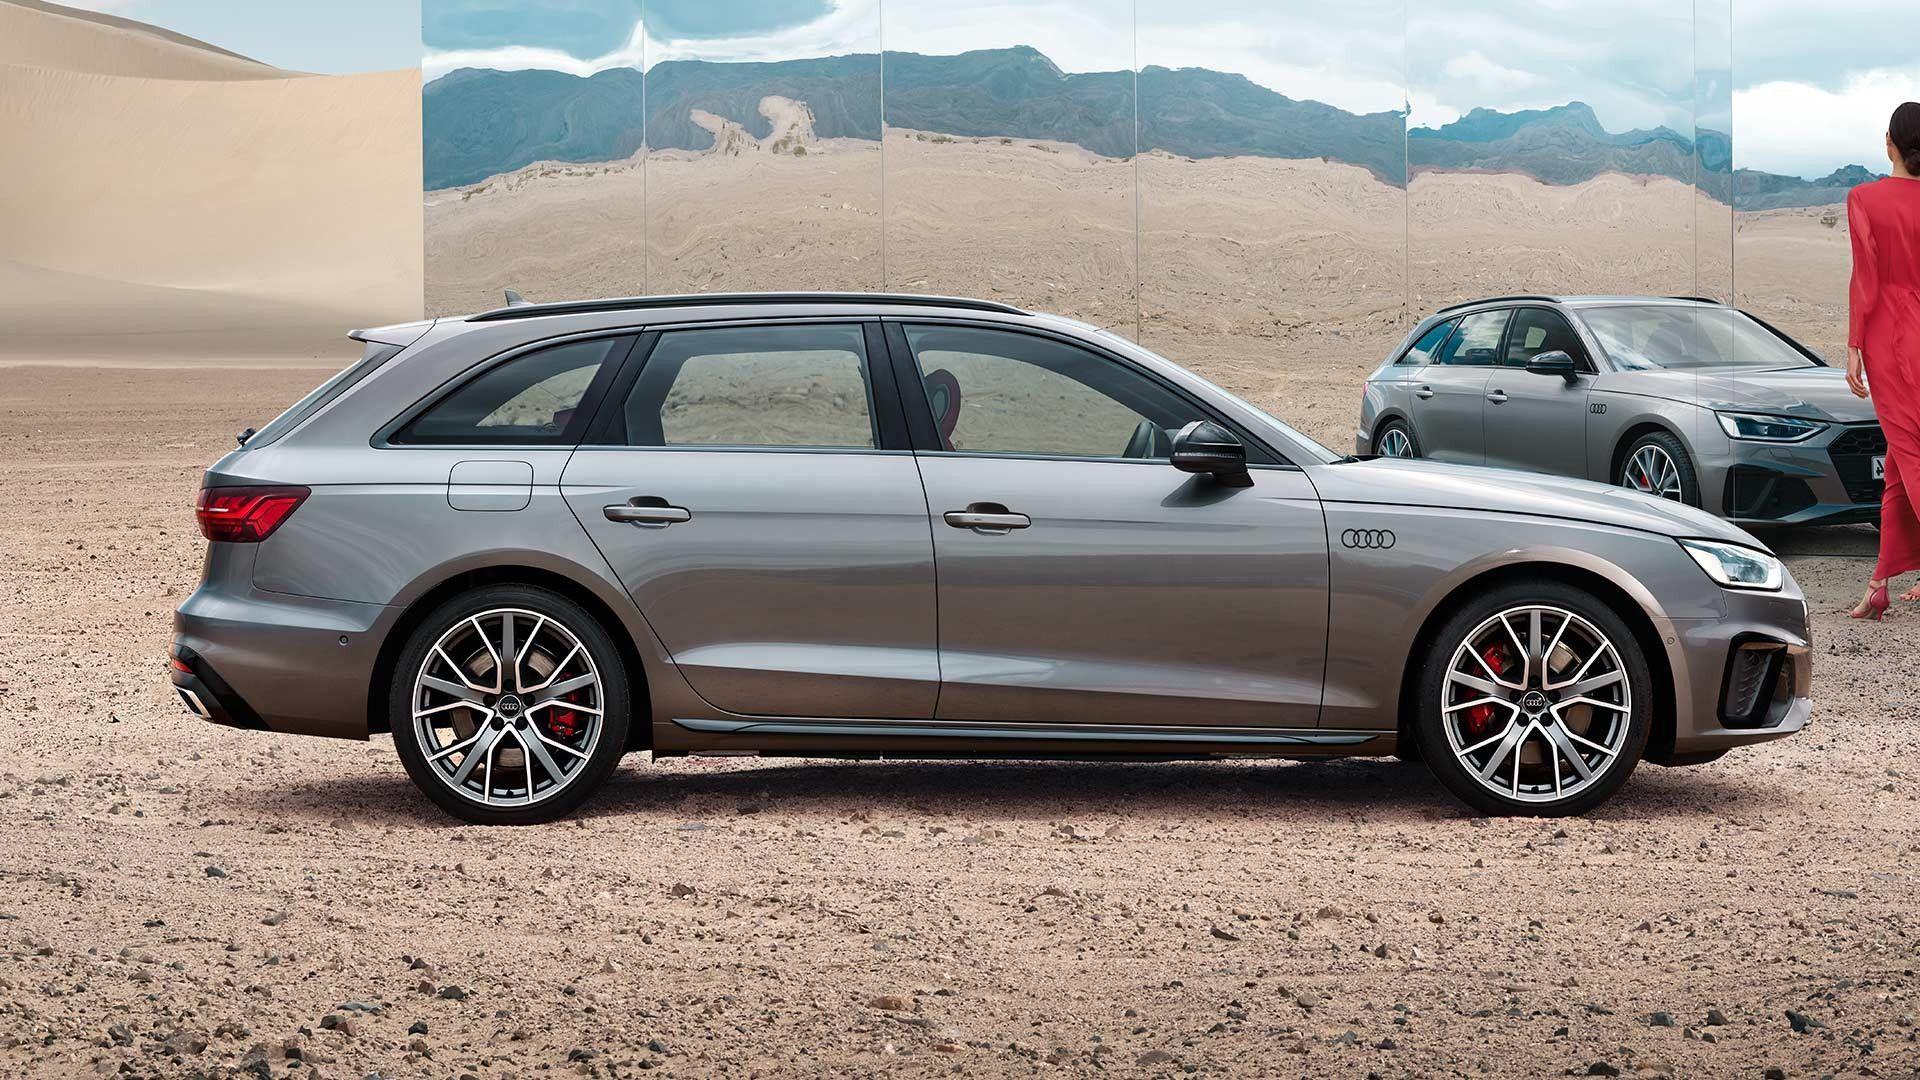 Audi A4 2020 Konfigurator Spesification 2020